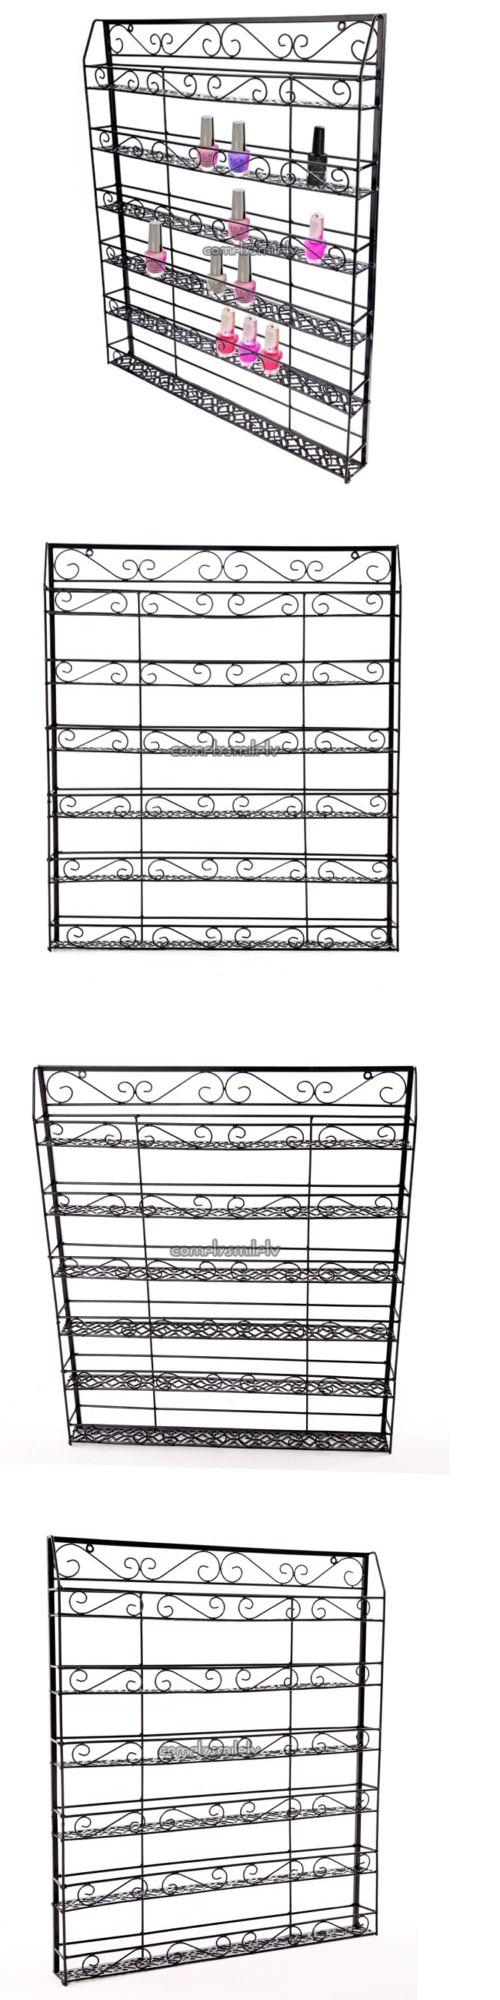 Ebay Nail Polish Display Rack- HireAbility